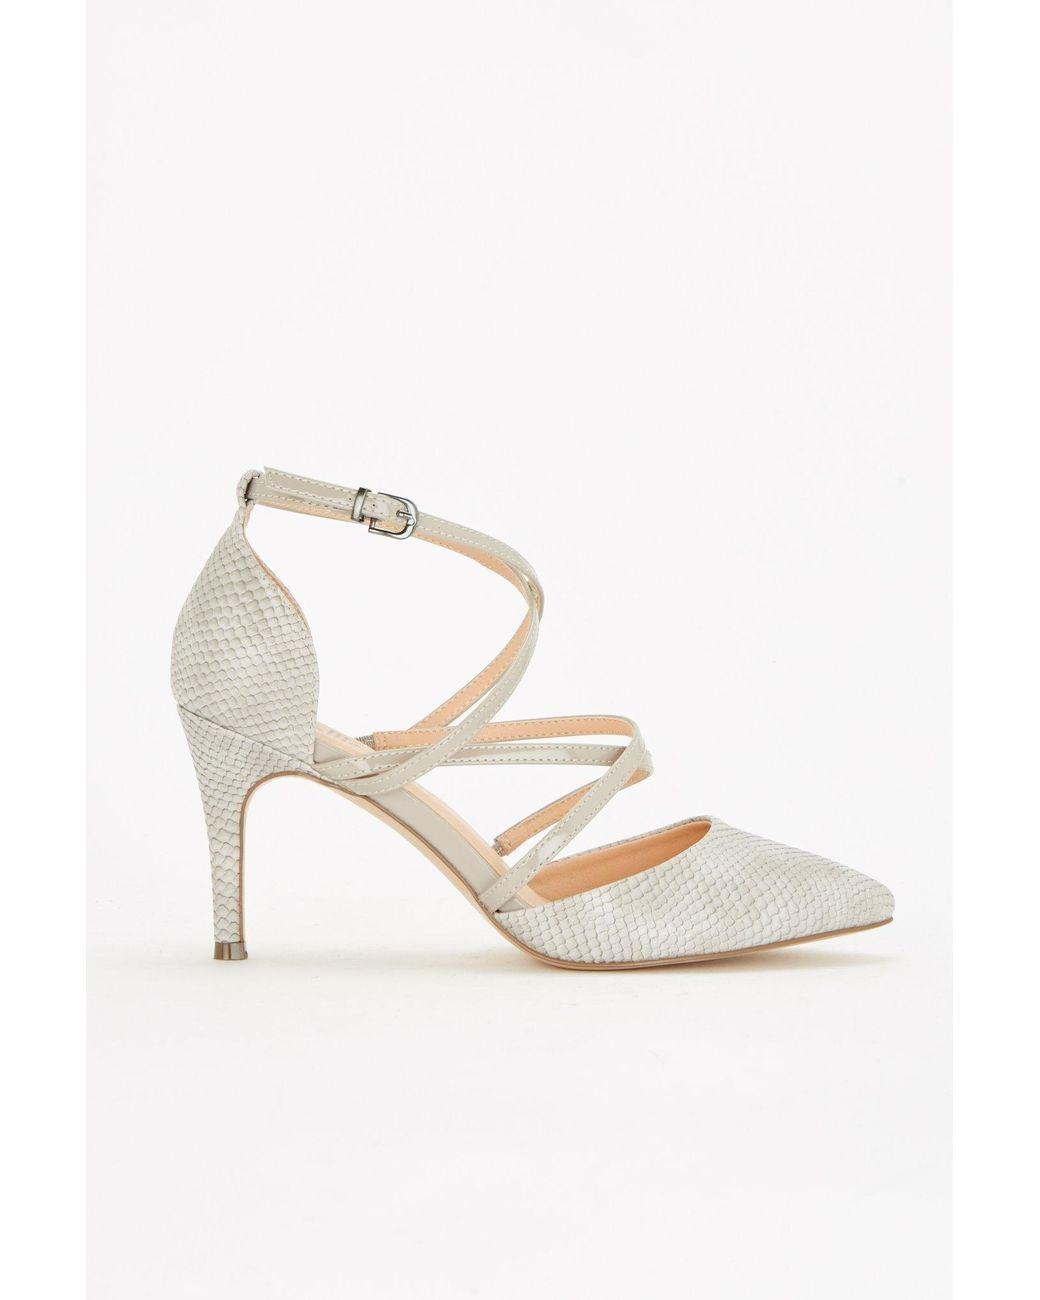 3ca172230 Wallis Light Grey Multi Strap Mid Heel Court Shoes in Gray - Lyst